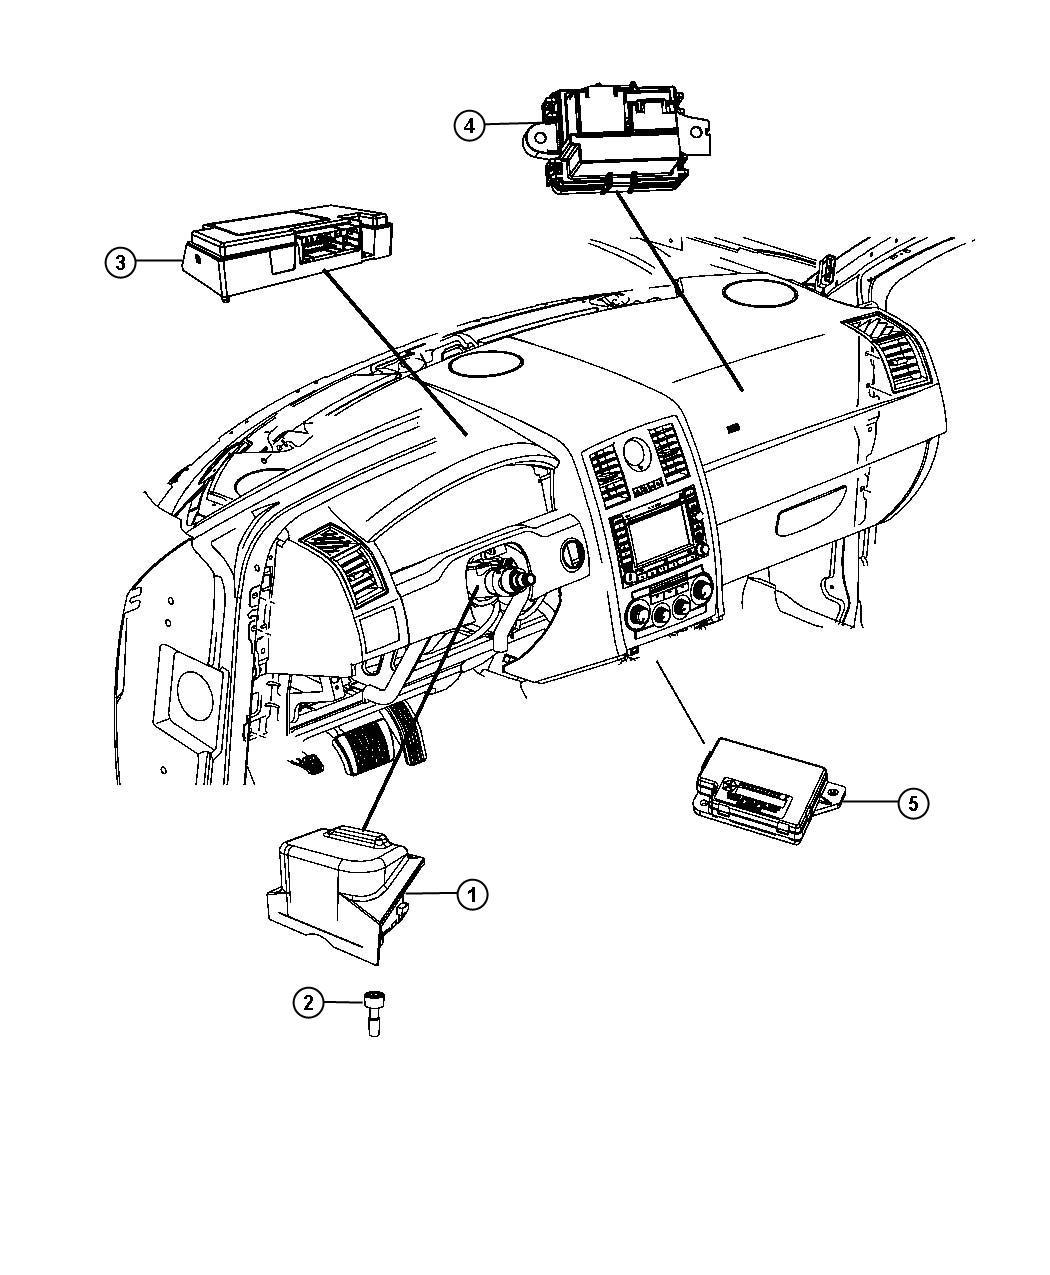 2013 Chrysler 300 Module. Telematics. Hfm, those